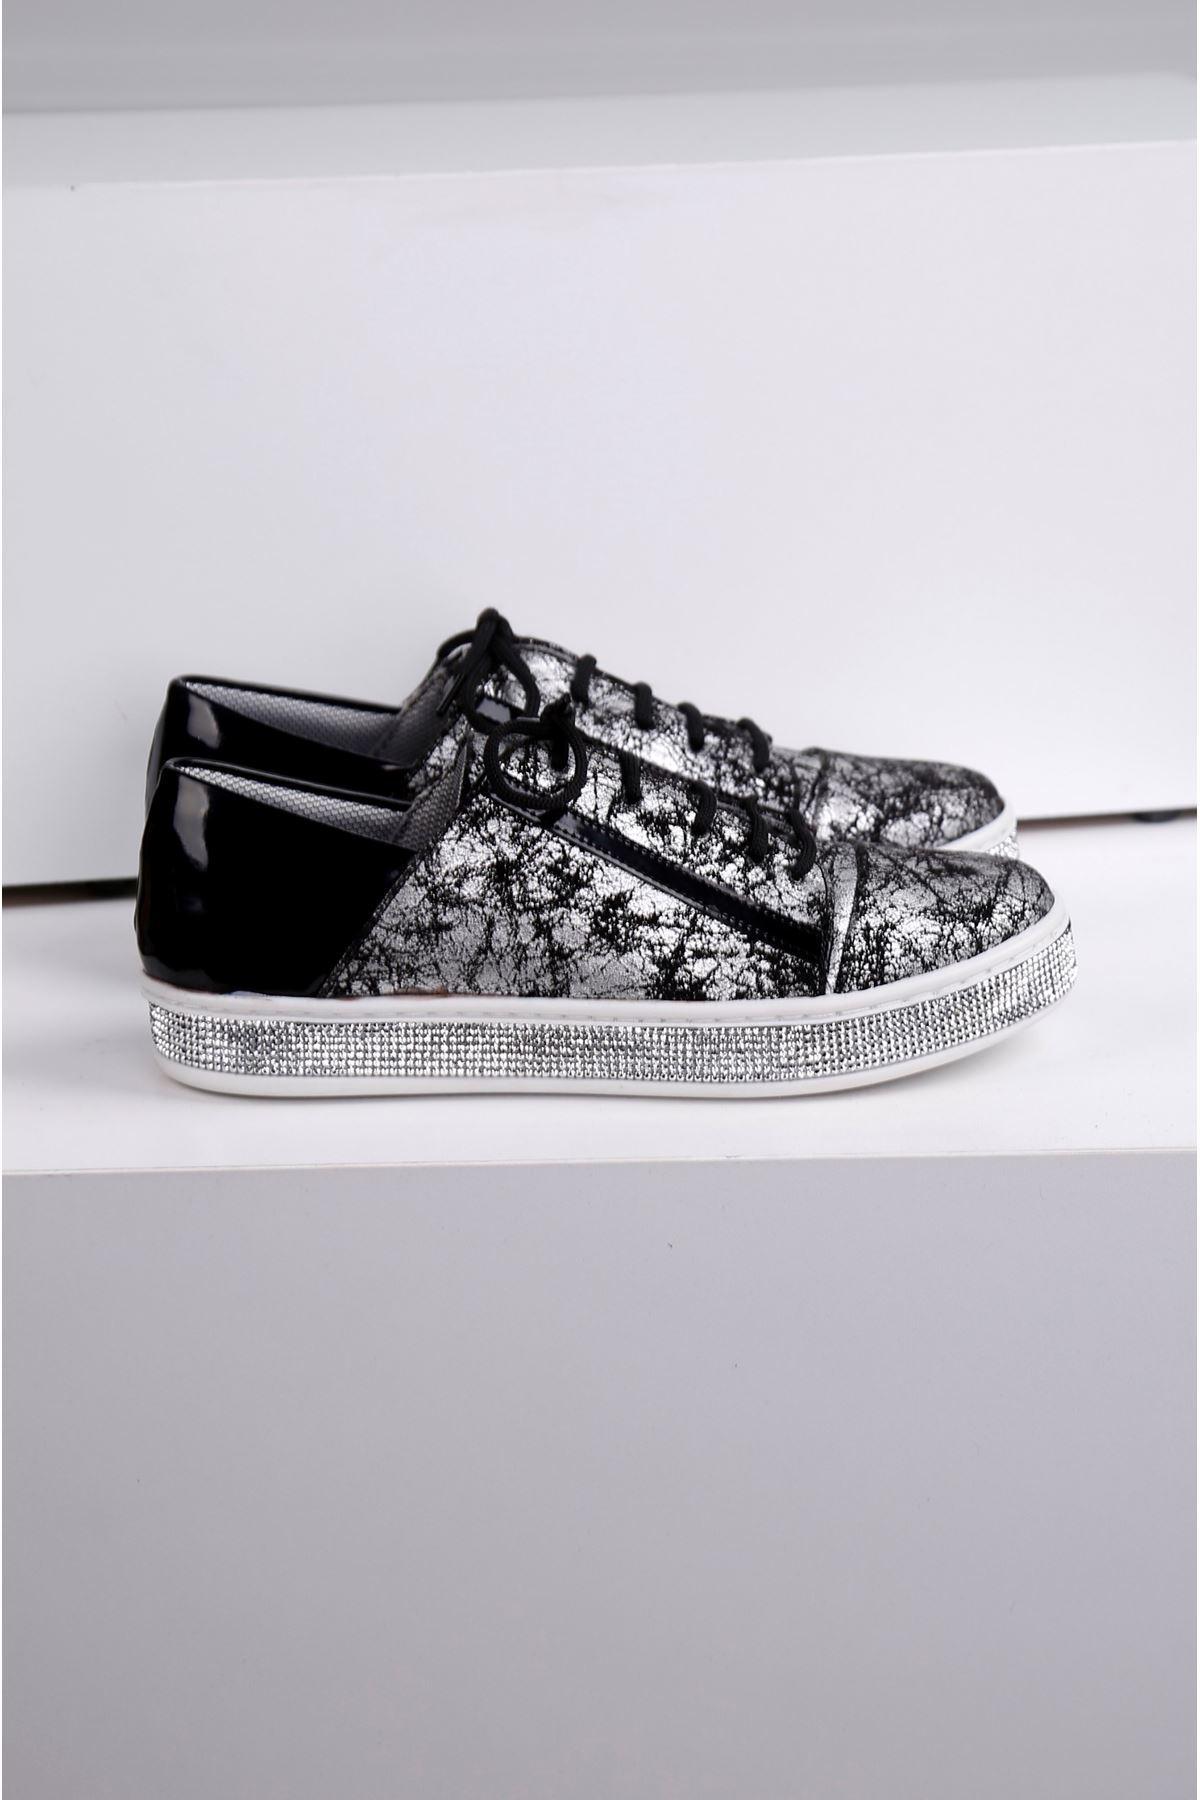 ESİLL Taban Taş Kaplama Ayakkabı